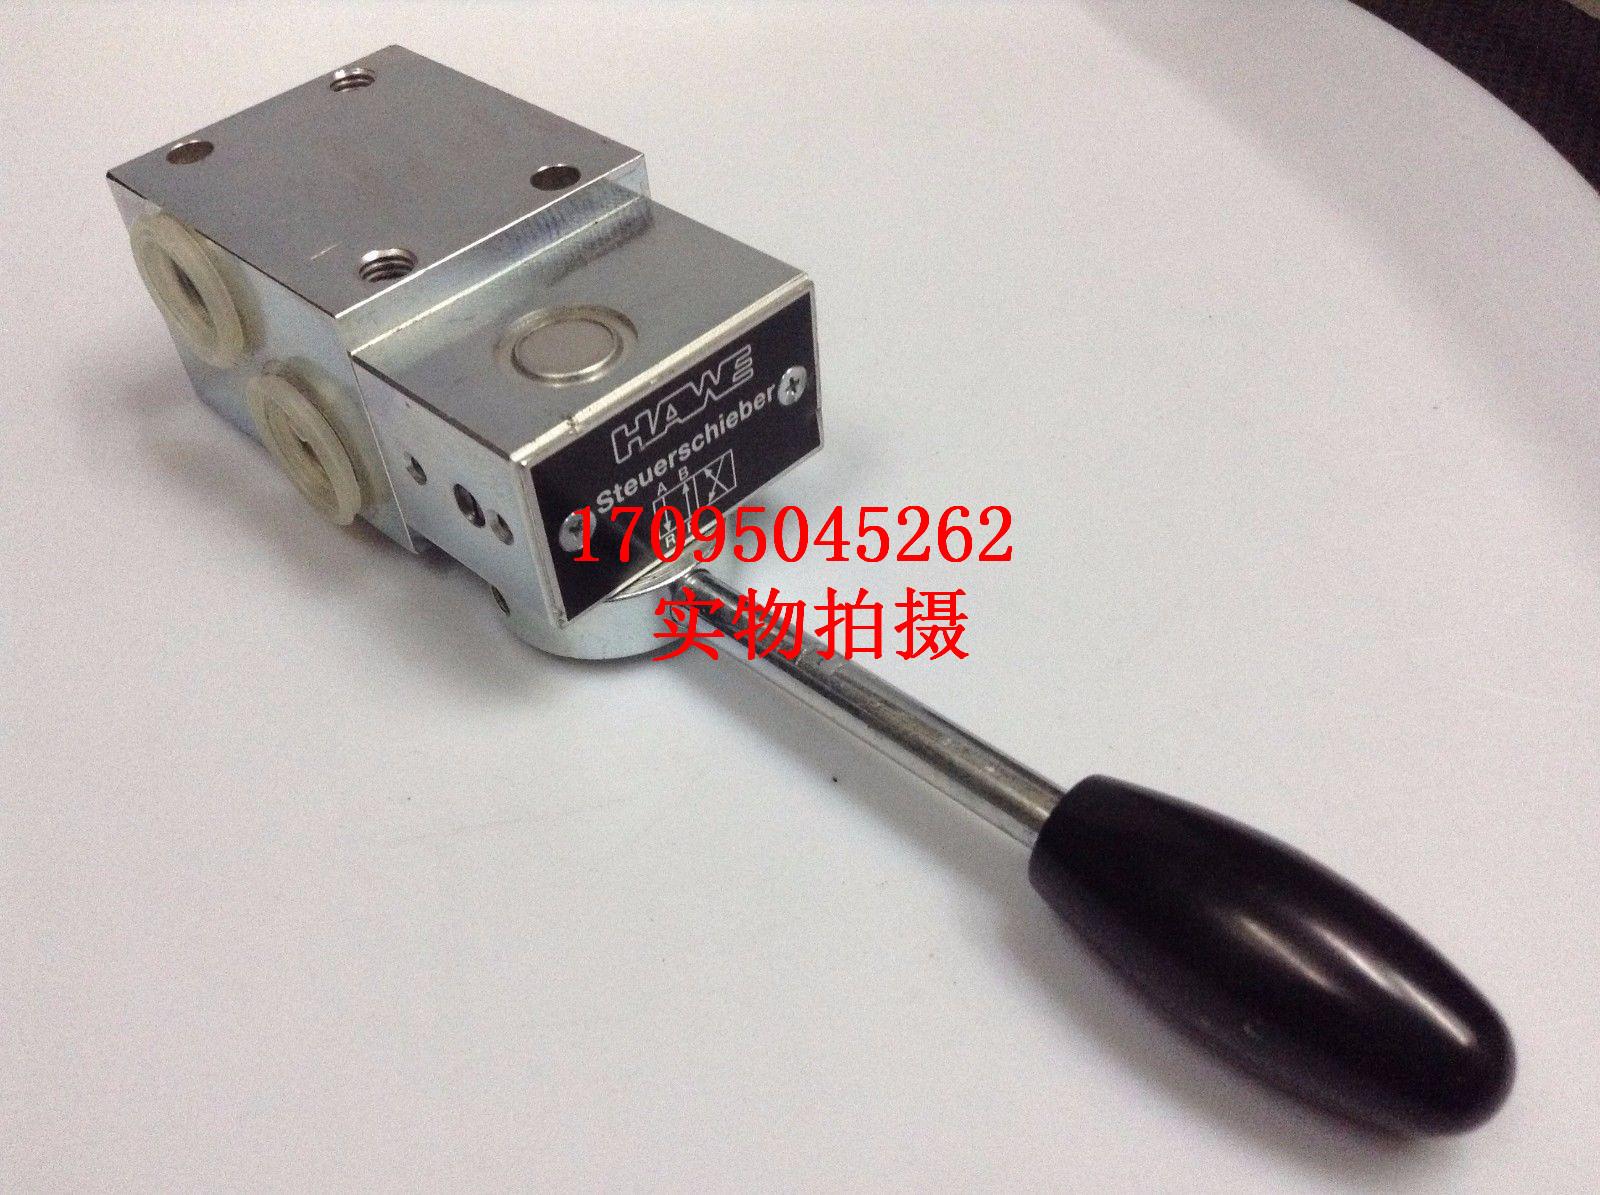 原装ドイツ輸入哈威油圧バルブ電磁弁手動切換弁HAWESG1WAKS調圧弁